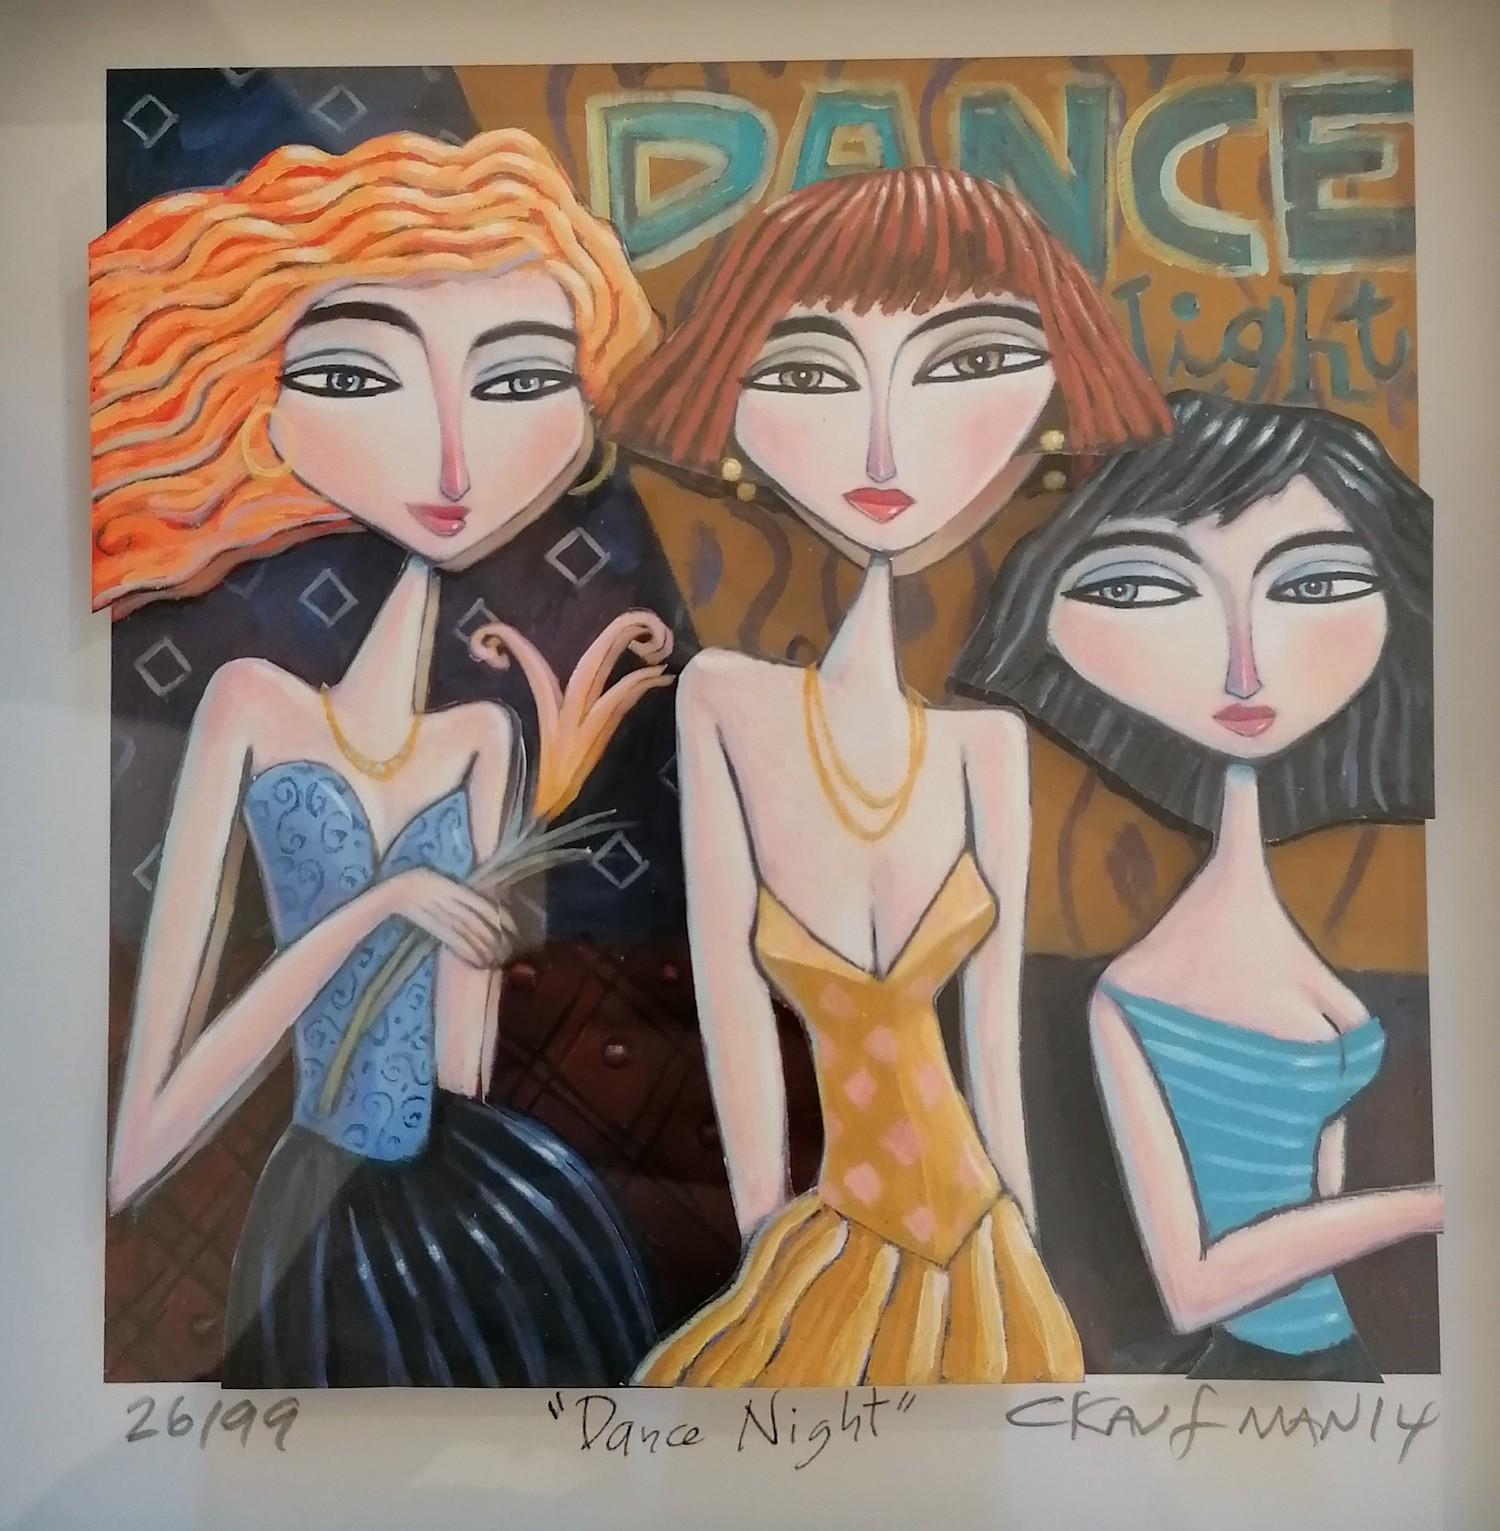 Dance night - Kaufmann, Charles - k-CHK389